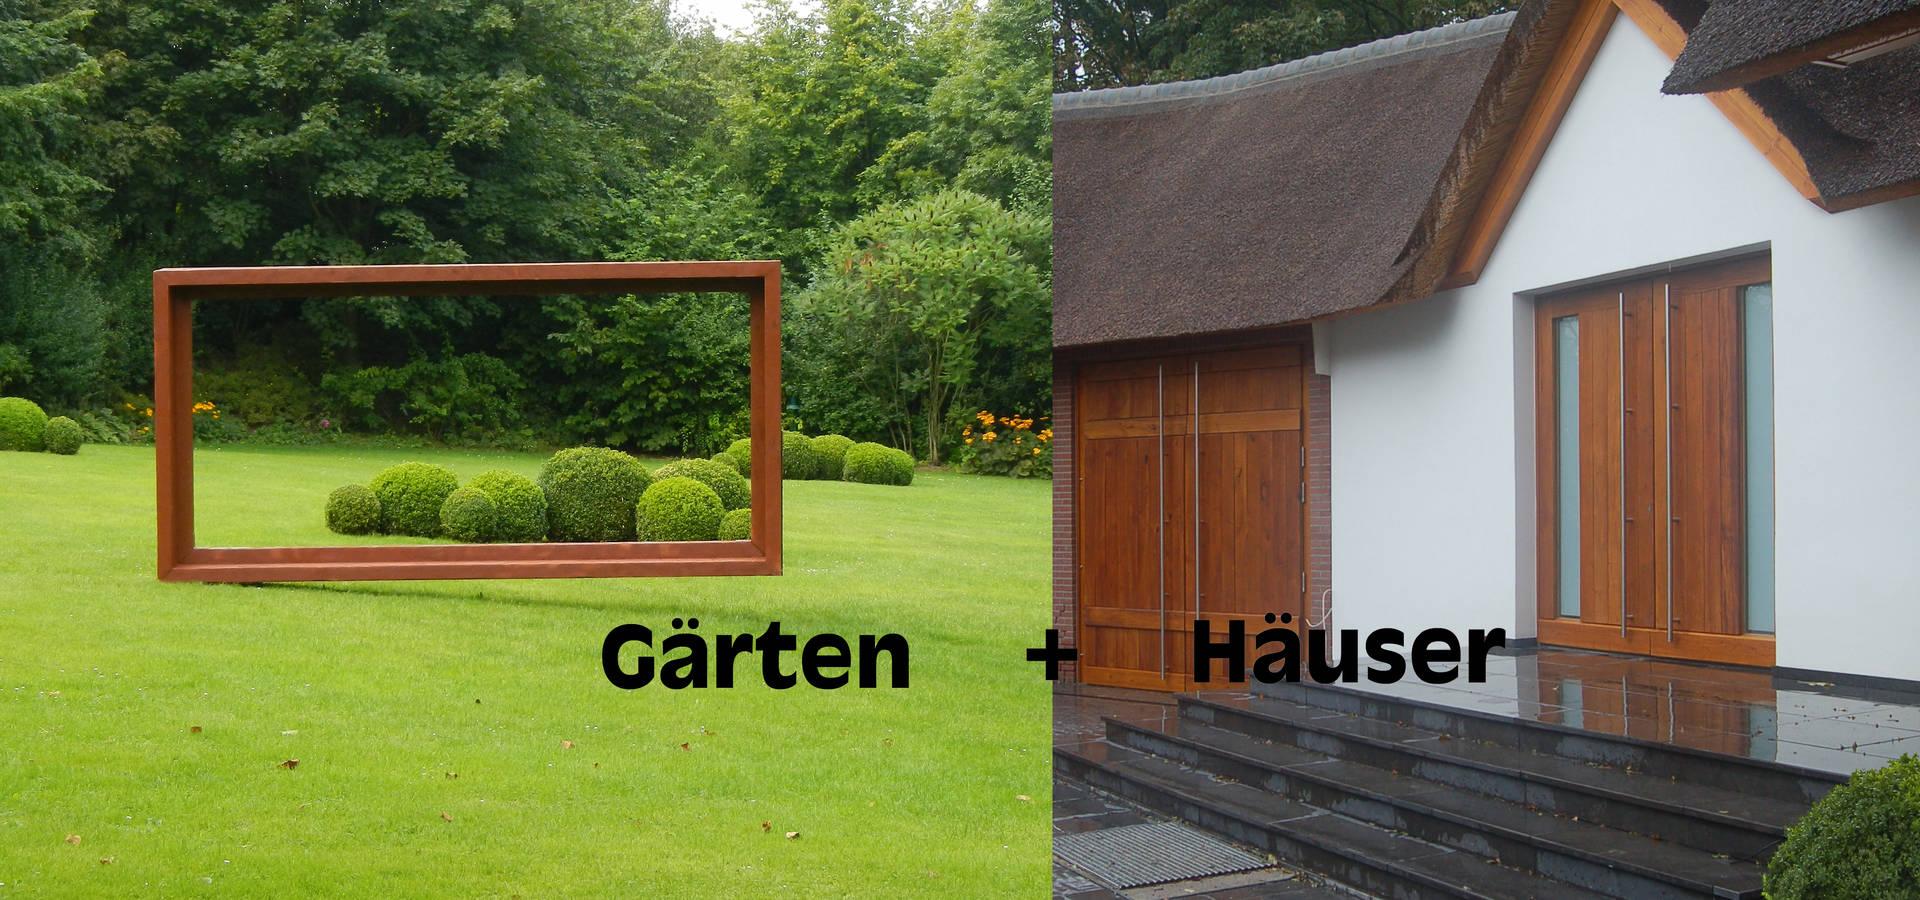 Architekt Krefeld 2kn architekt landschaftsarchitekt thorsten kasel sven